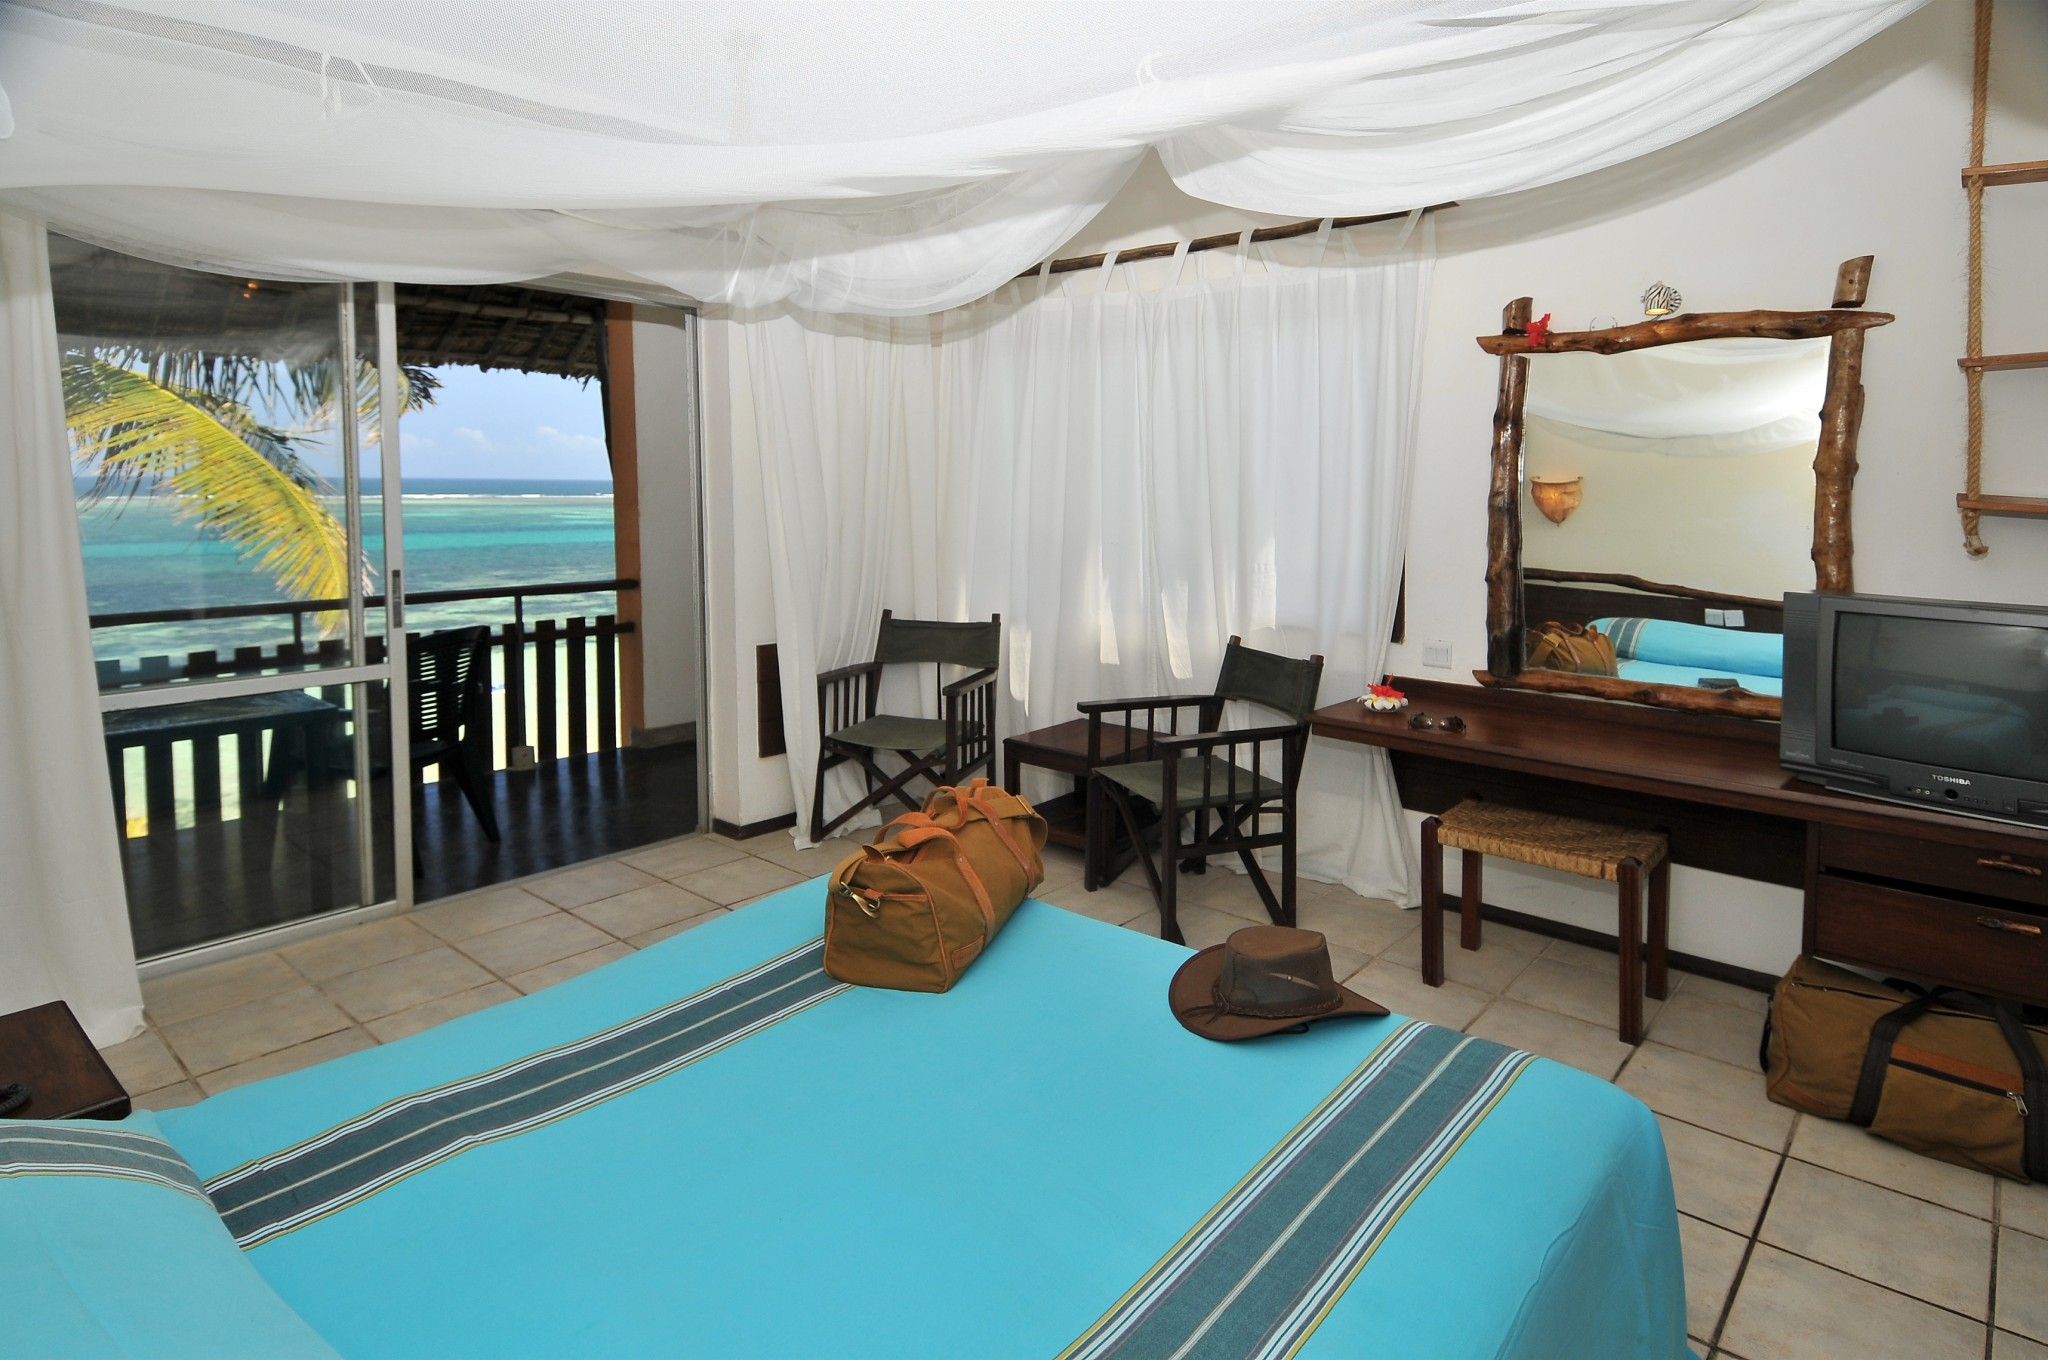 bahari beach hotel buchen. Black Bedroom Furniture Sets. Home Design Ideas